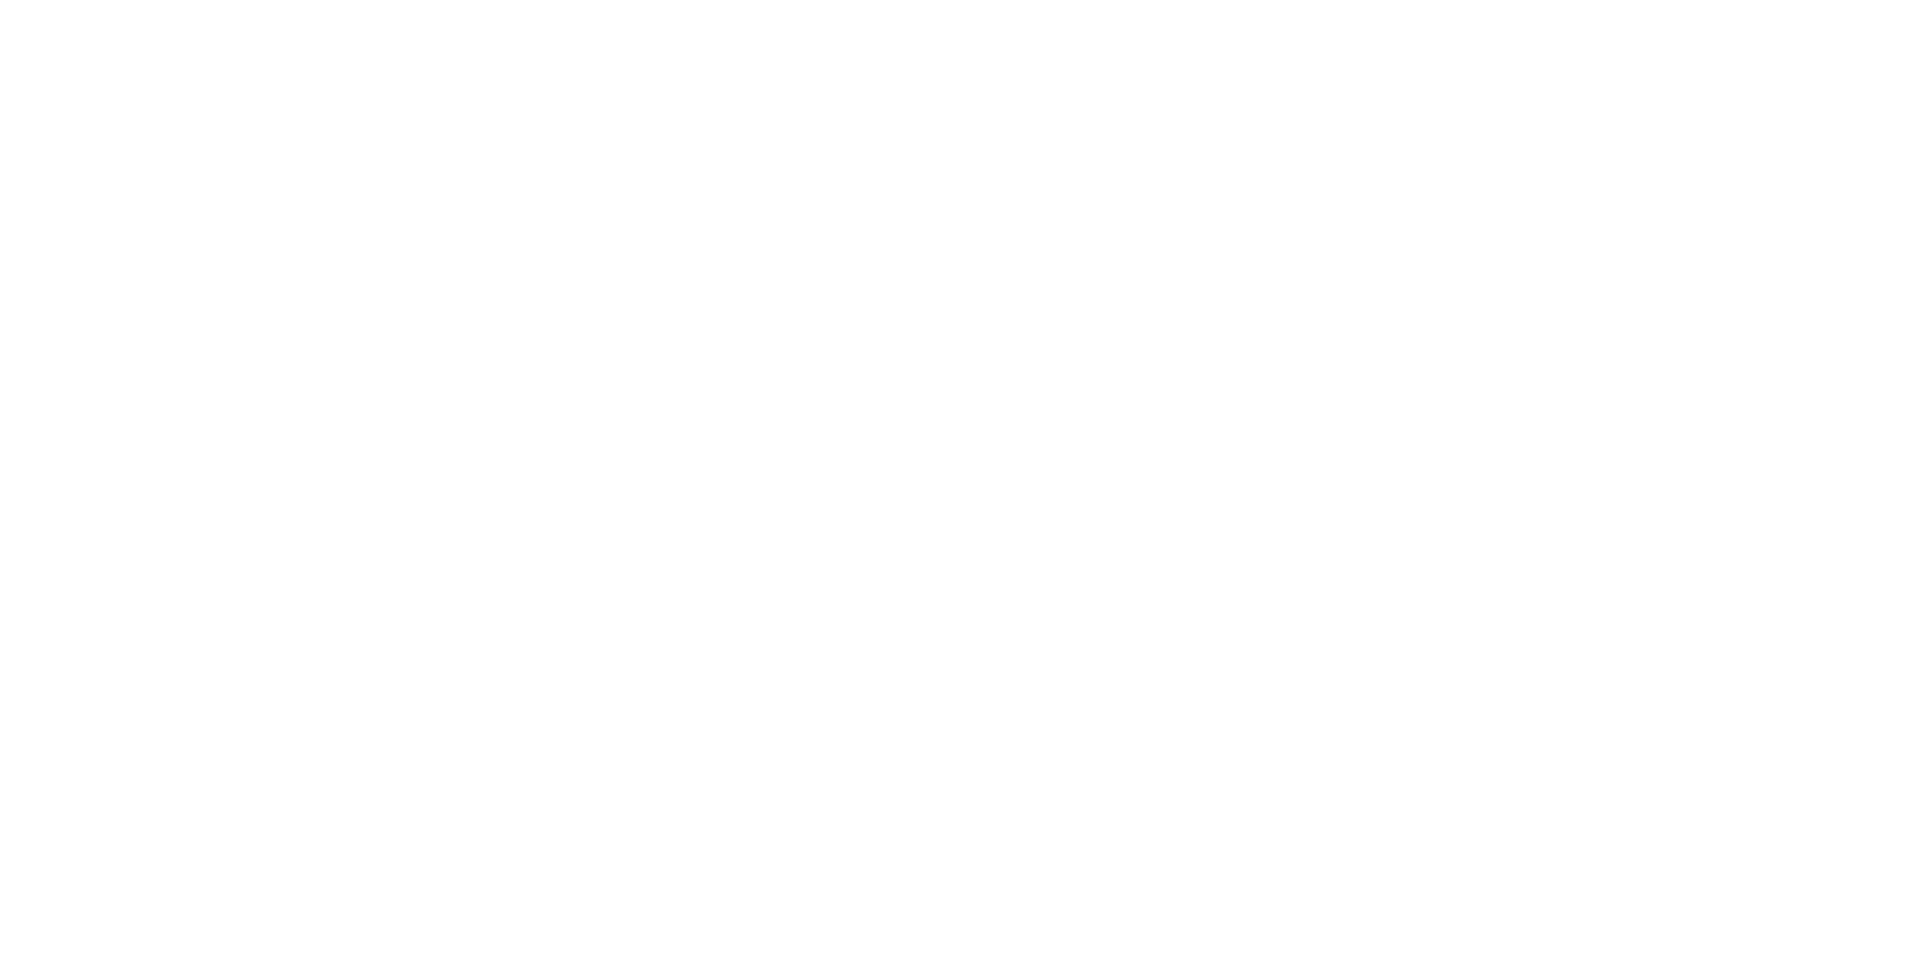 makingO2